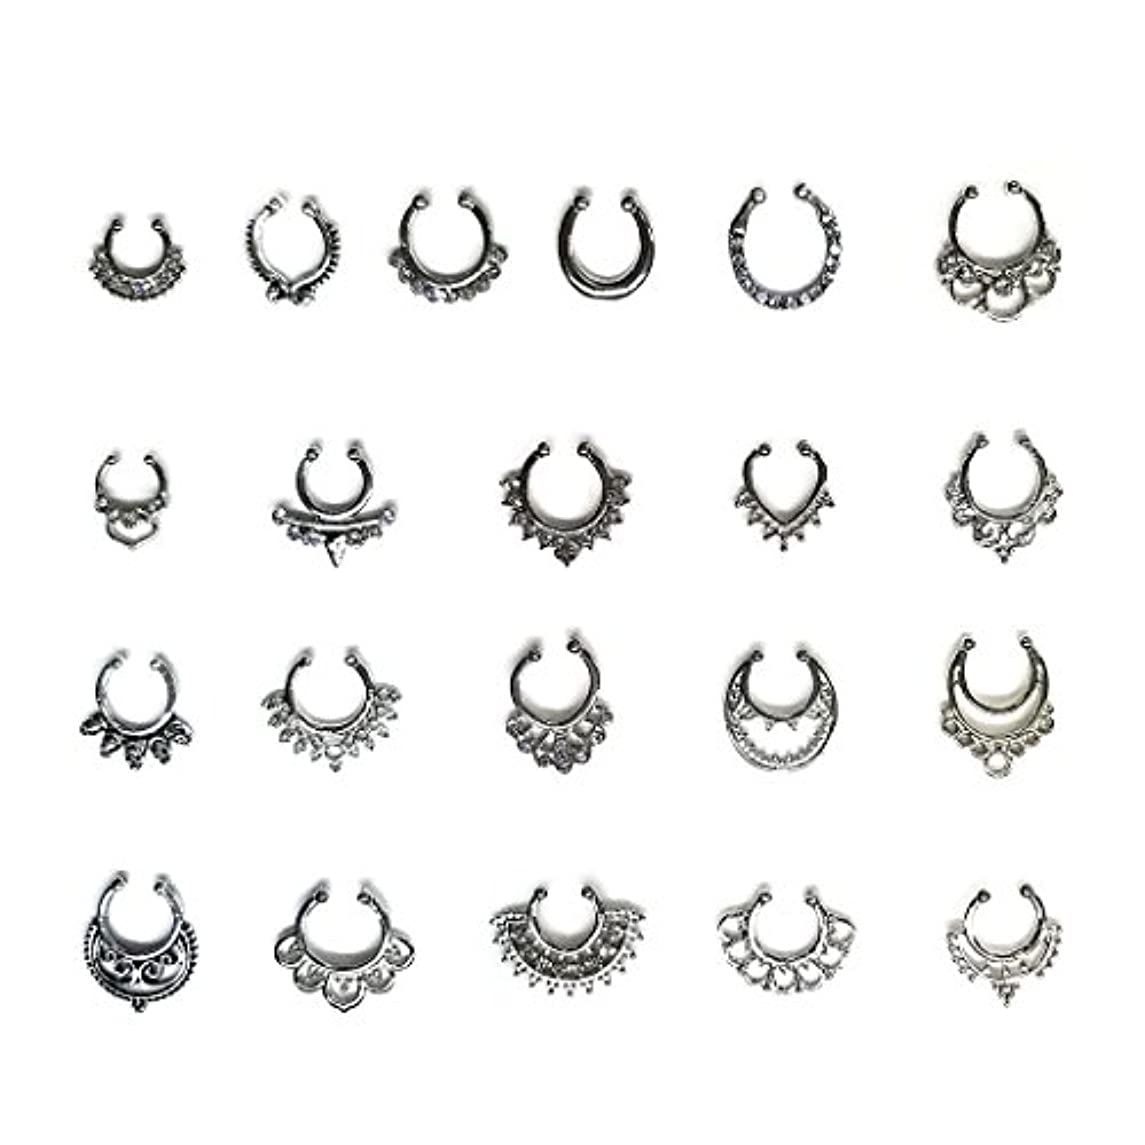 Aoyoho 21Pcs Fake Septum Clicker Nose Ring Rhinestone Non Piercing Hanger Clip Body Jewelry (Silver)